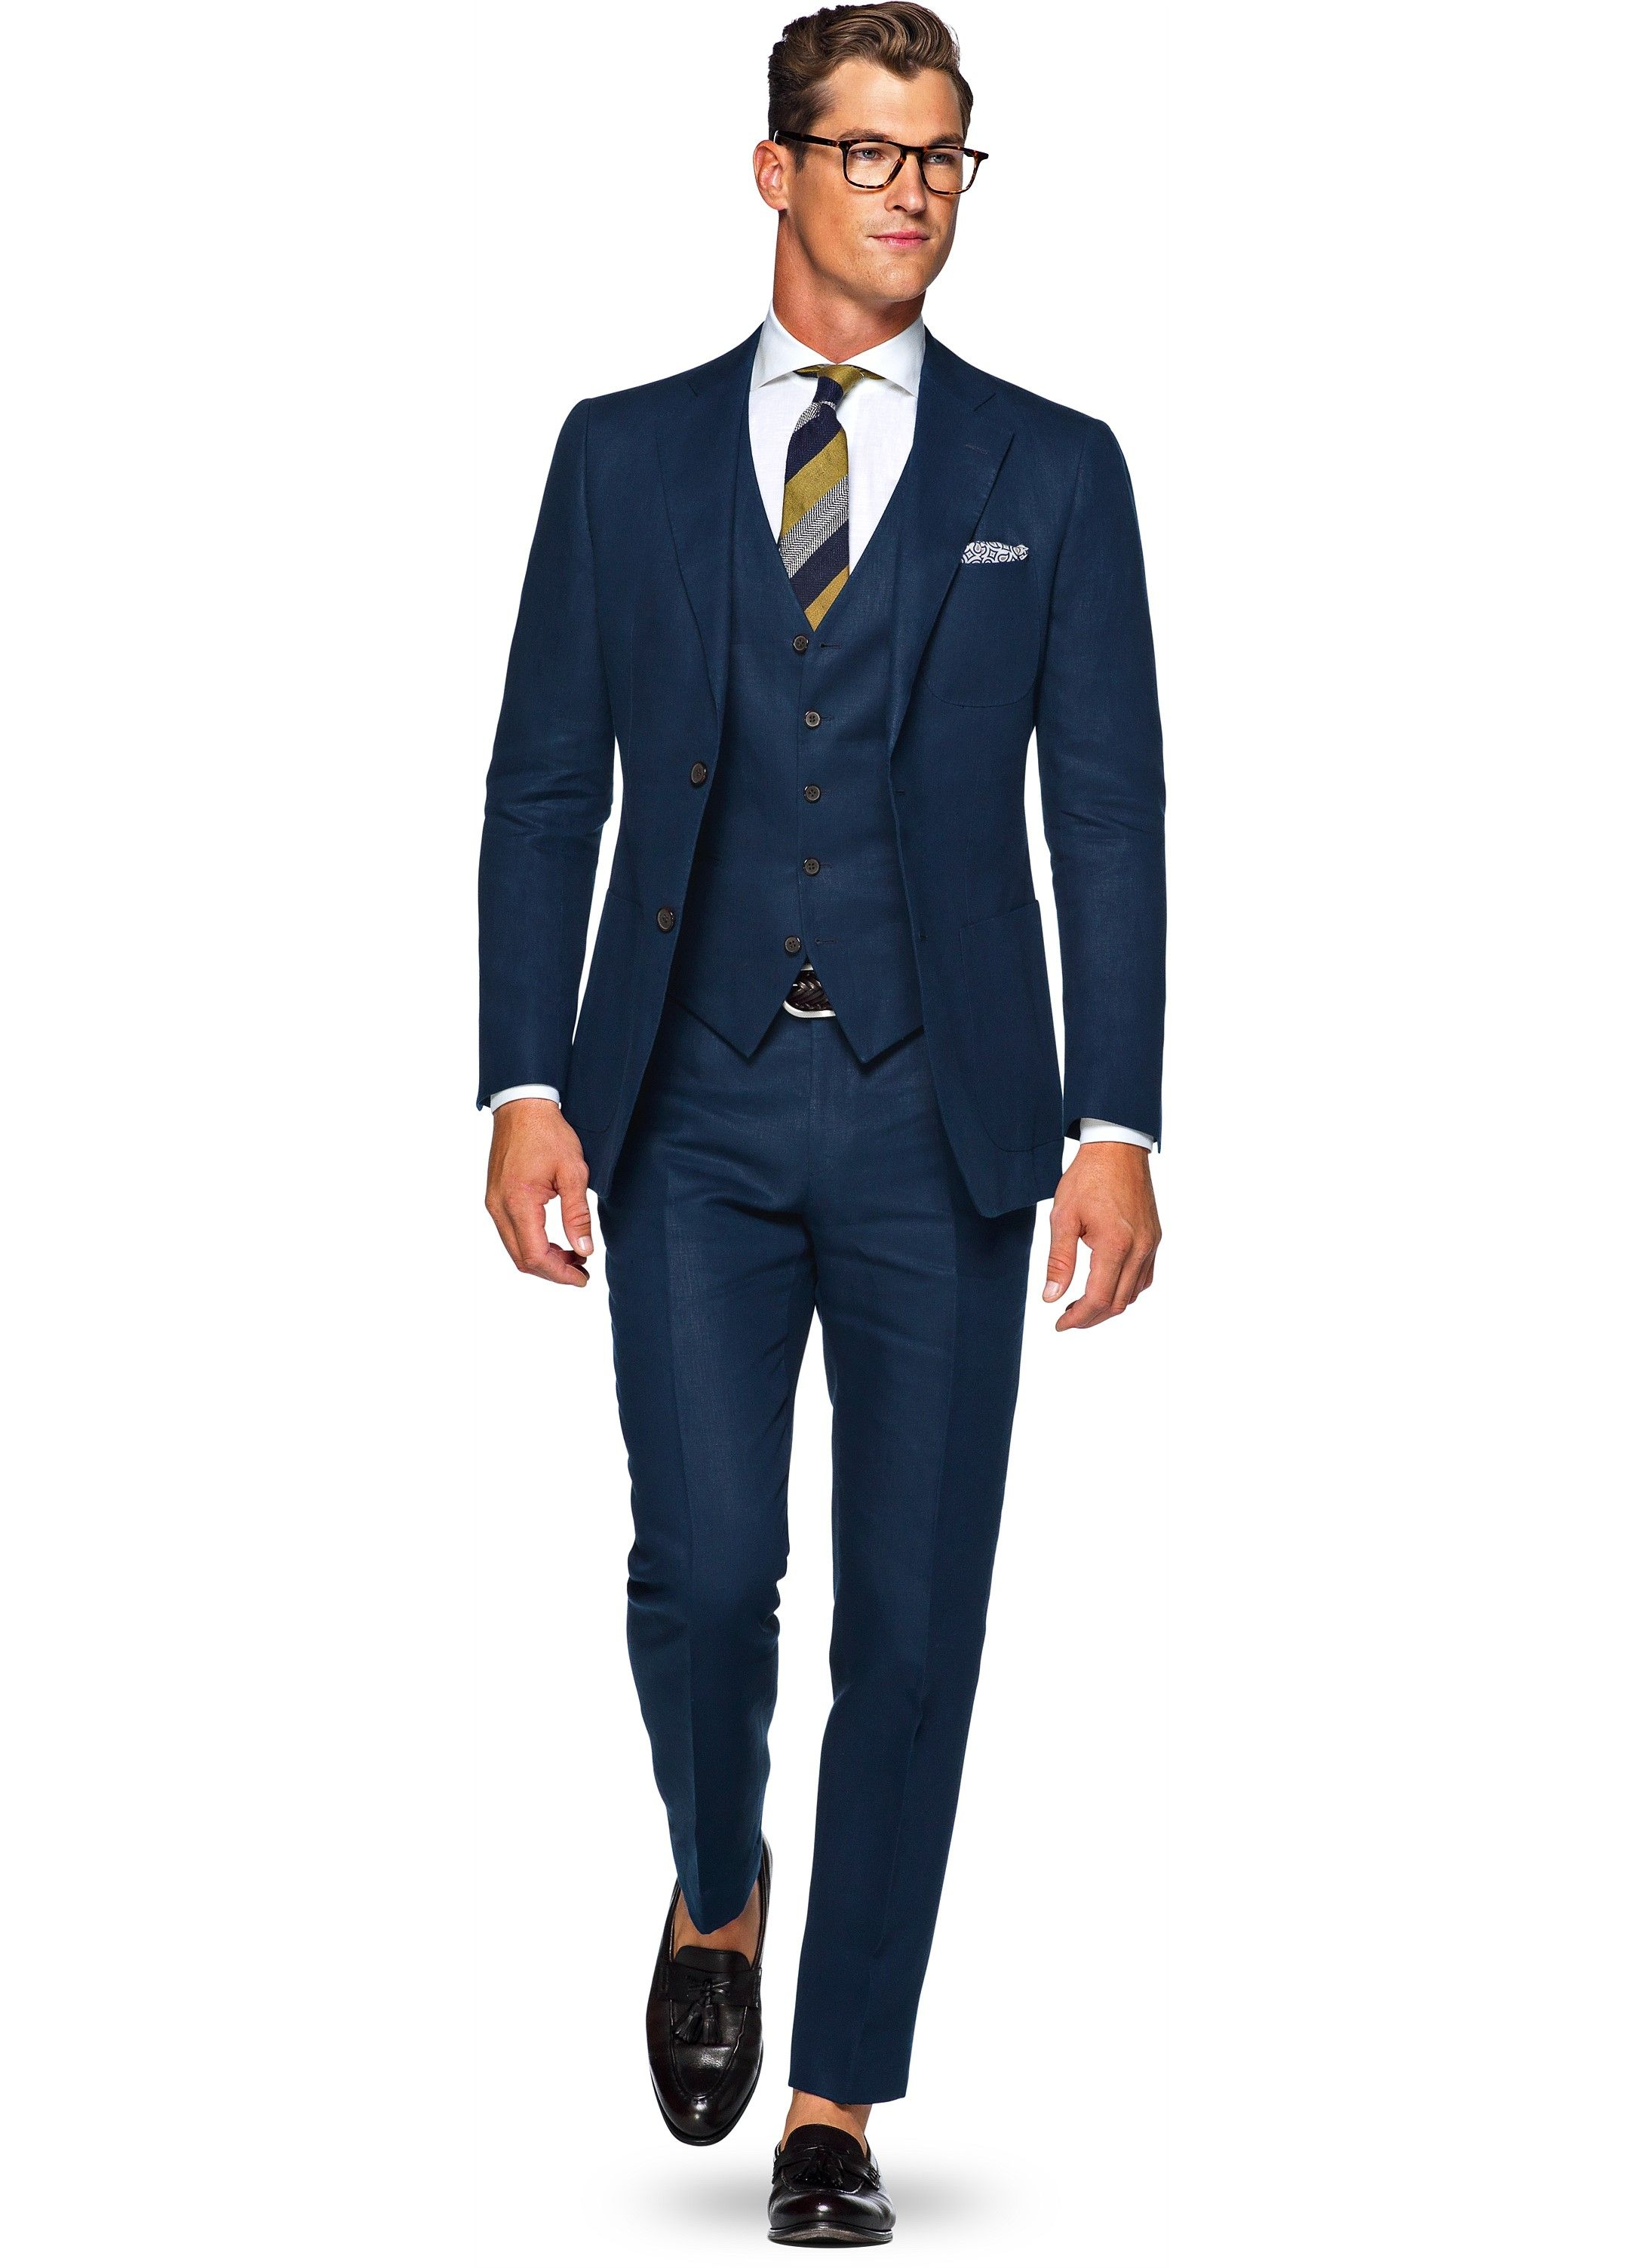 Suit Blue Plain Hudson P4814i Suitsupply Online Store In